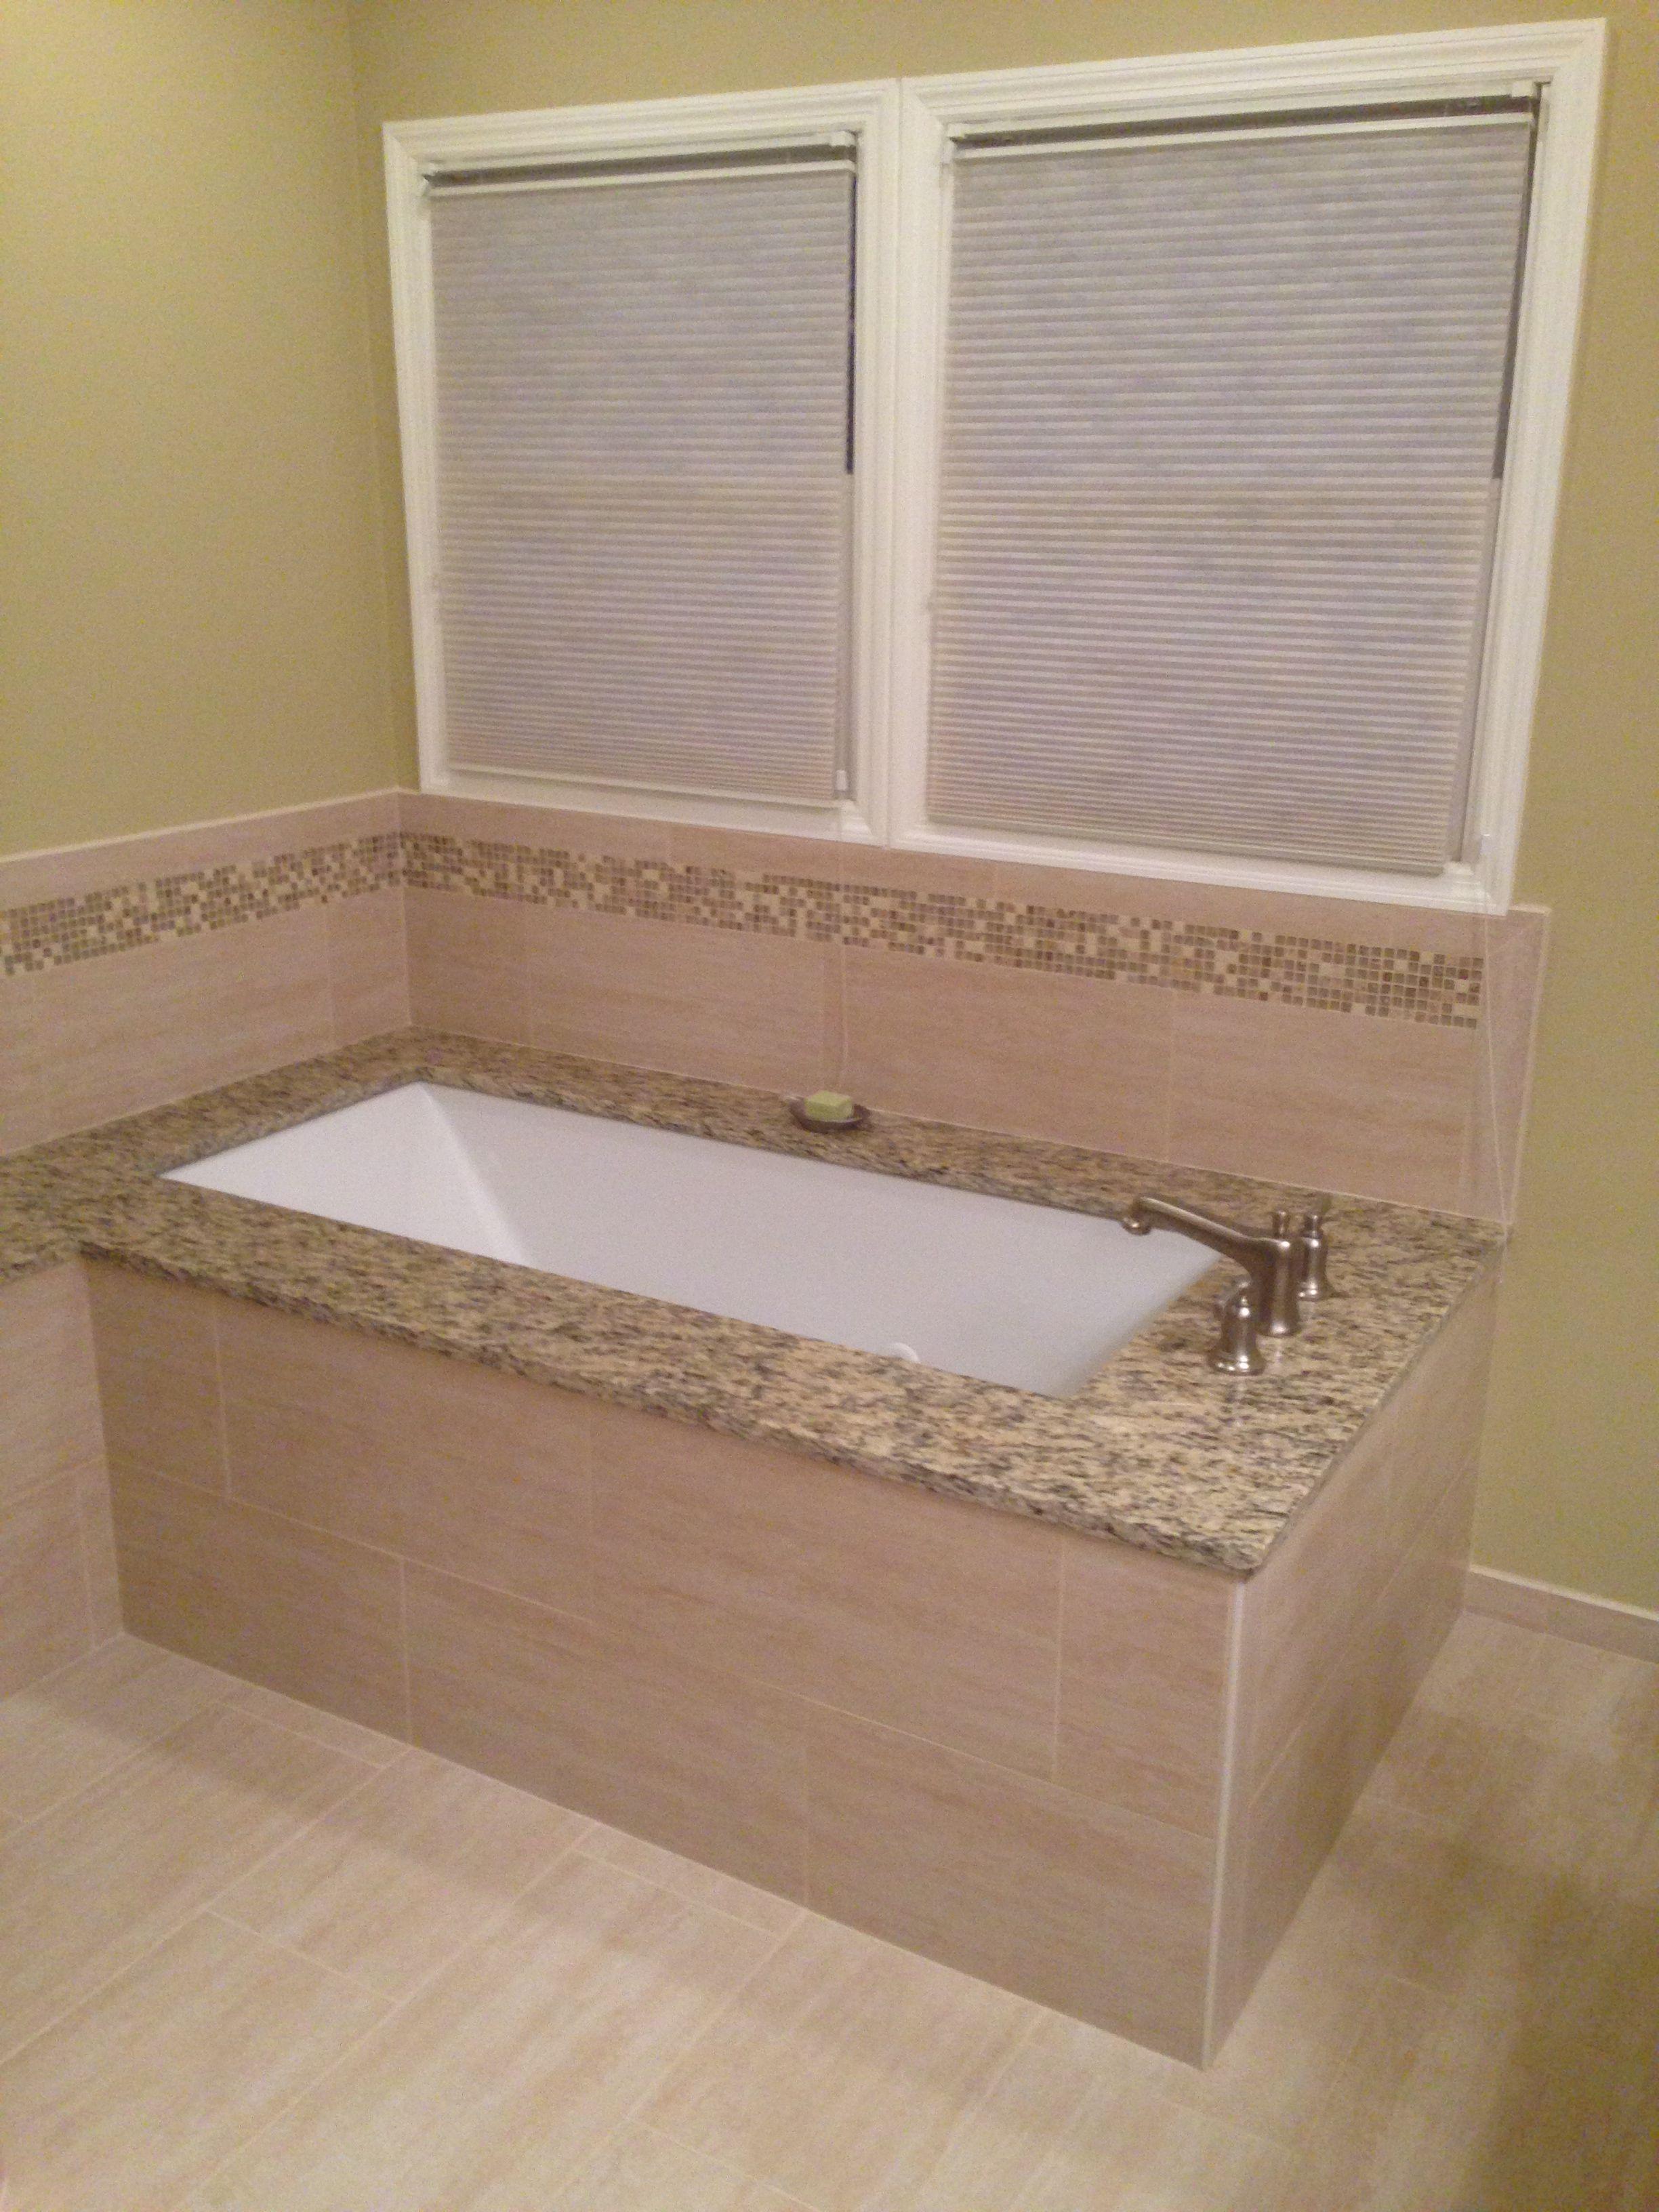 Under mount soaking tub with granite top Bathroom Remodeling Remodeling Ideas Granite Tops